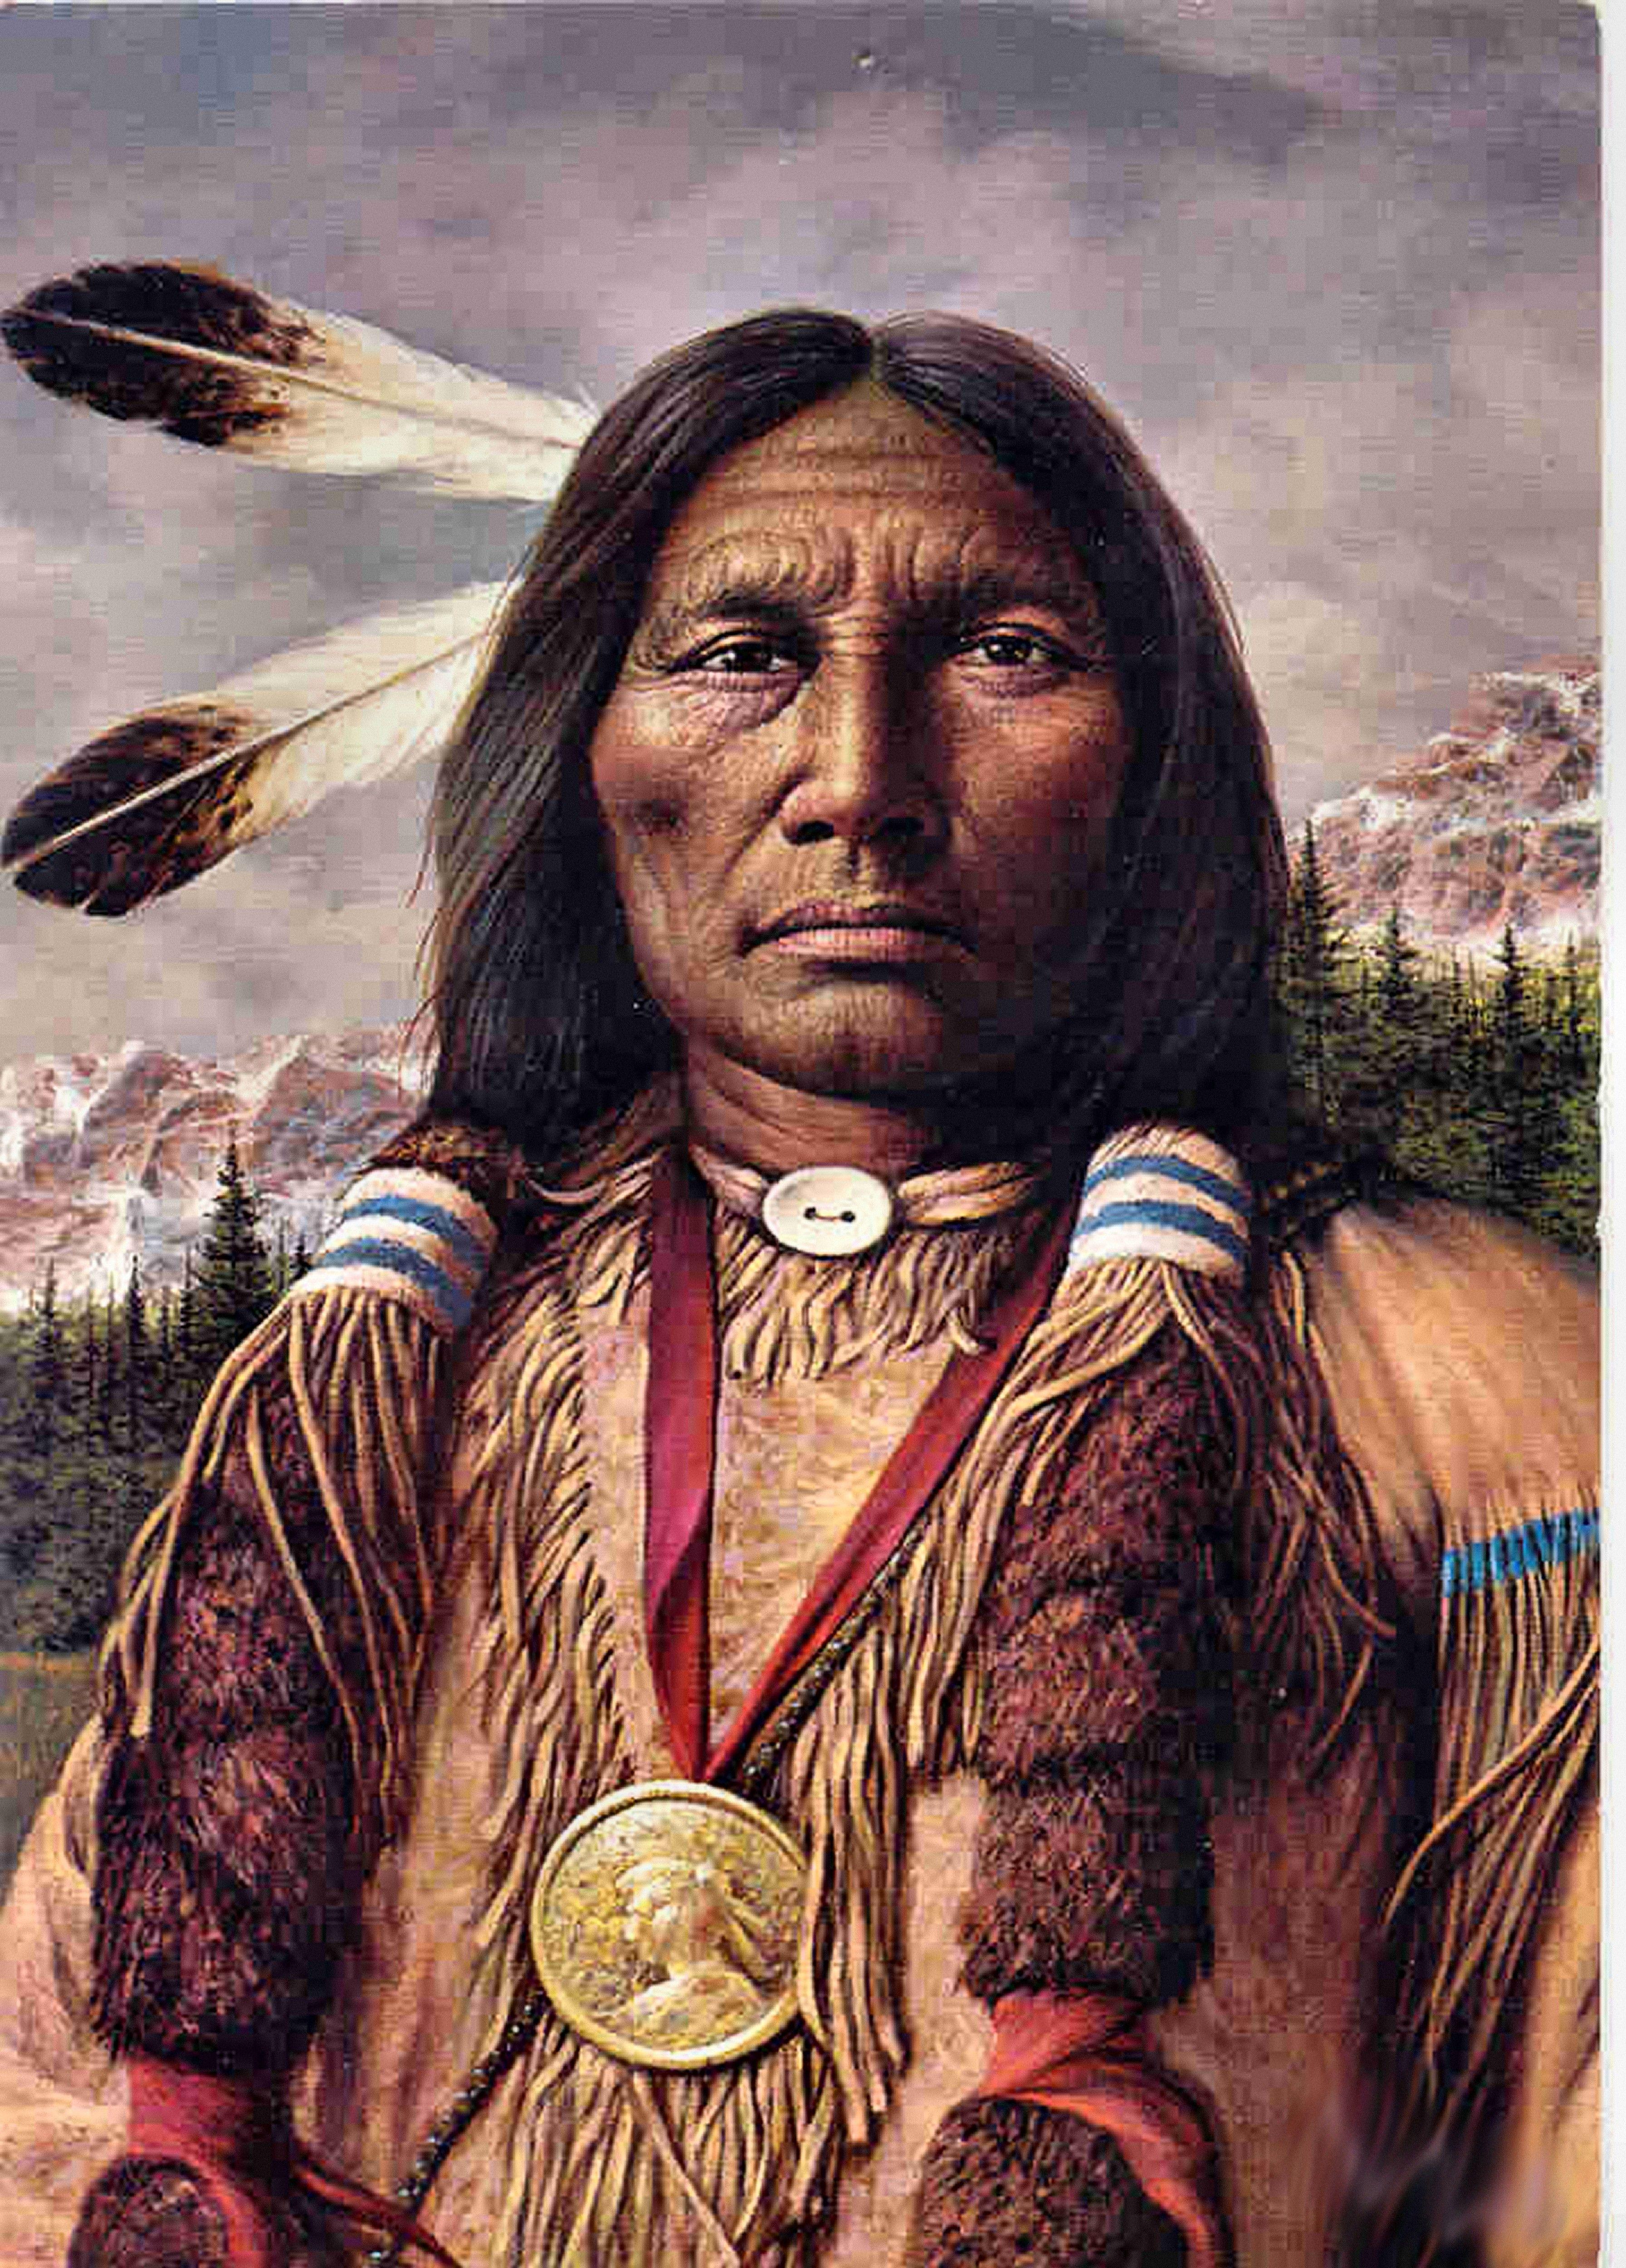 Pin de Jess Corts en LOS INDIOS  Pinterest  Native american art Native american images y